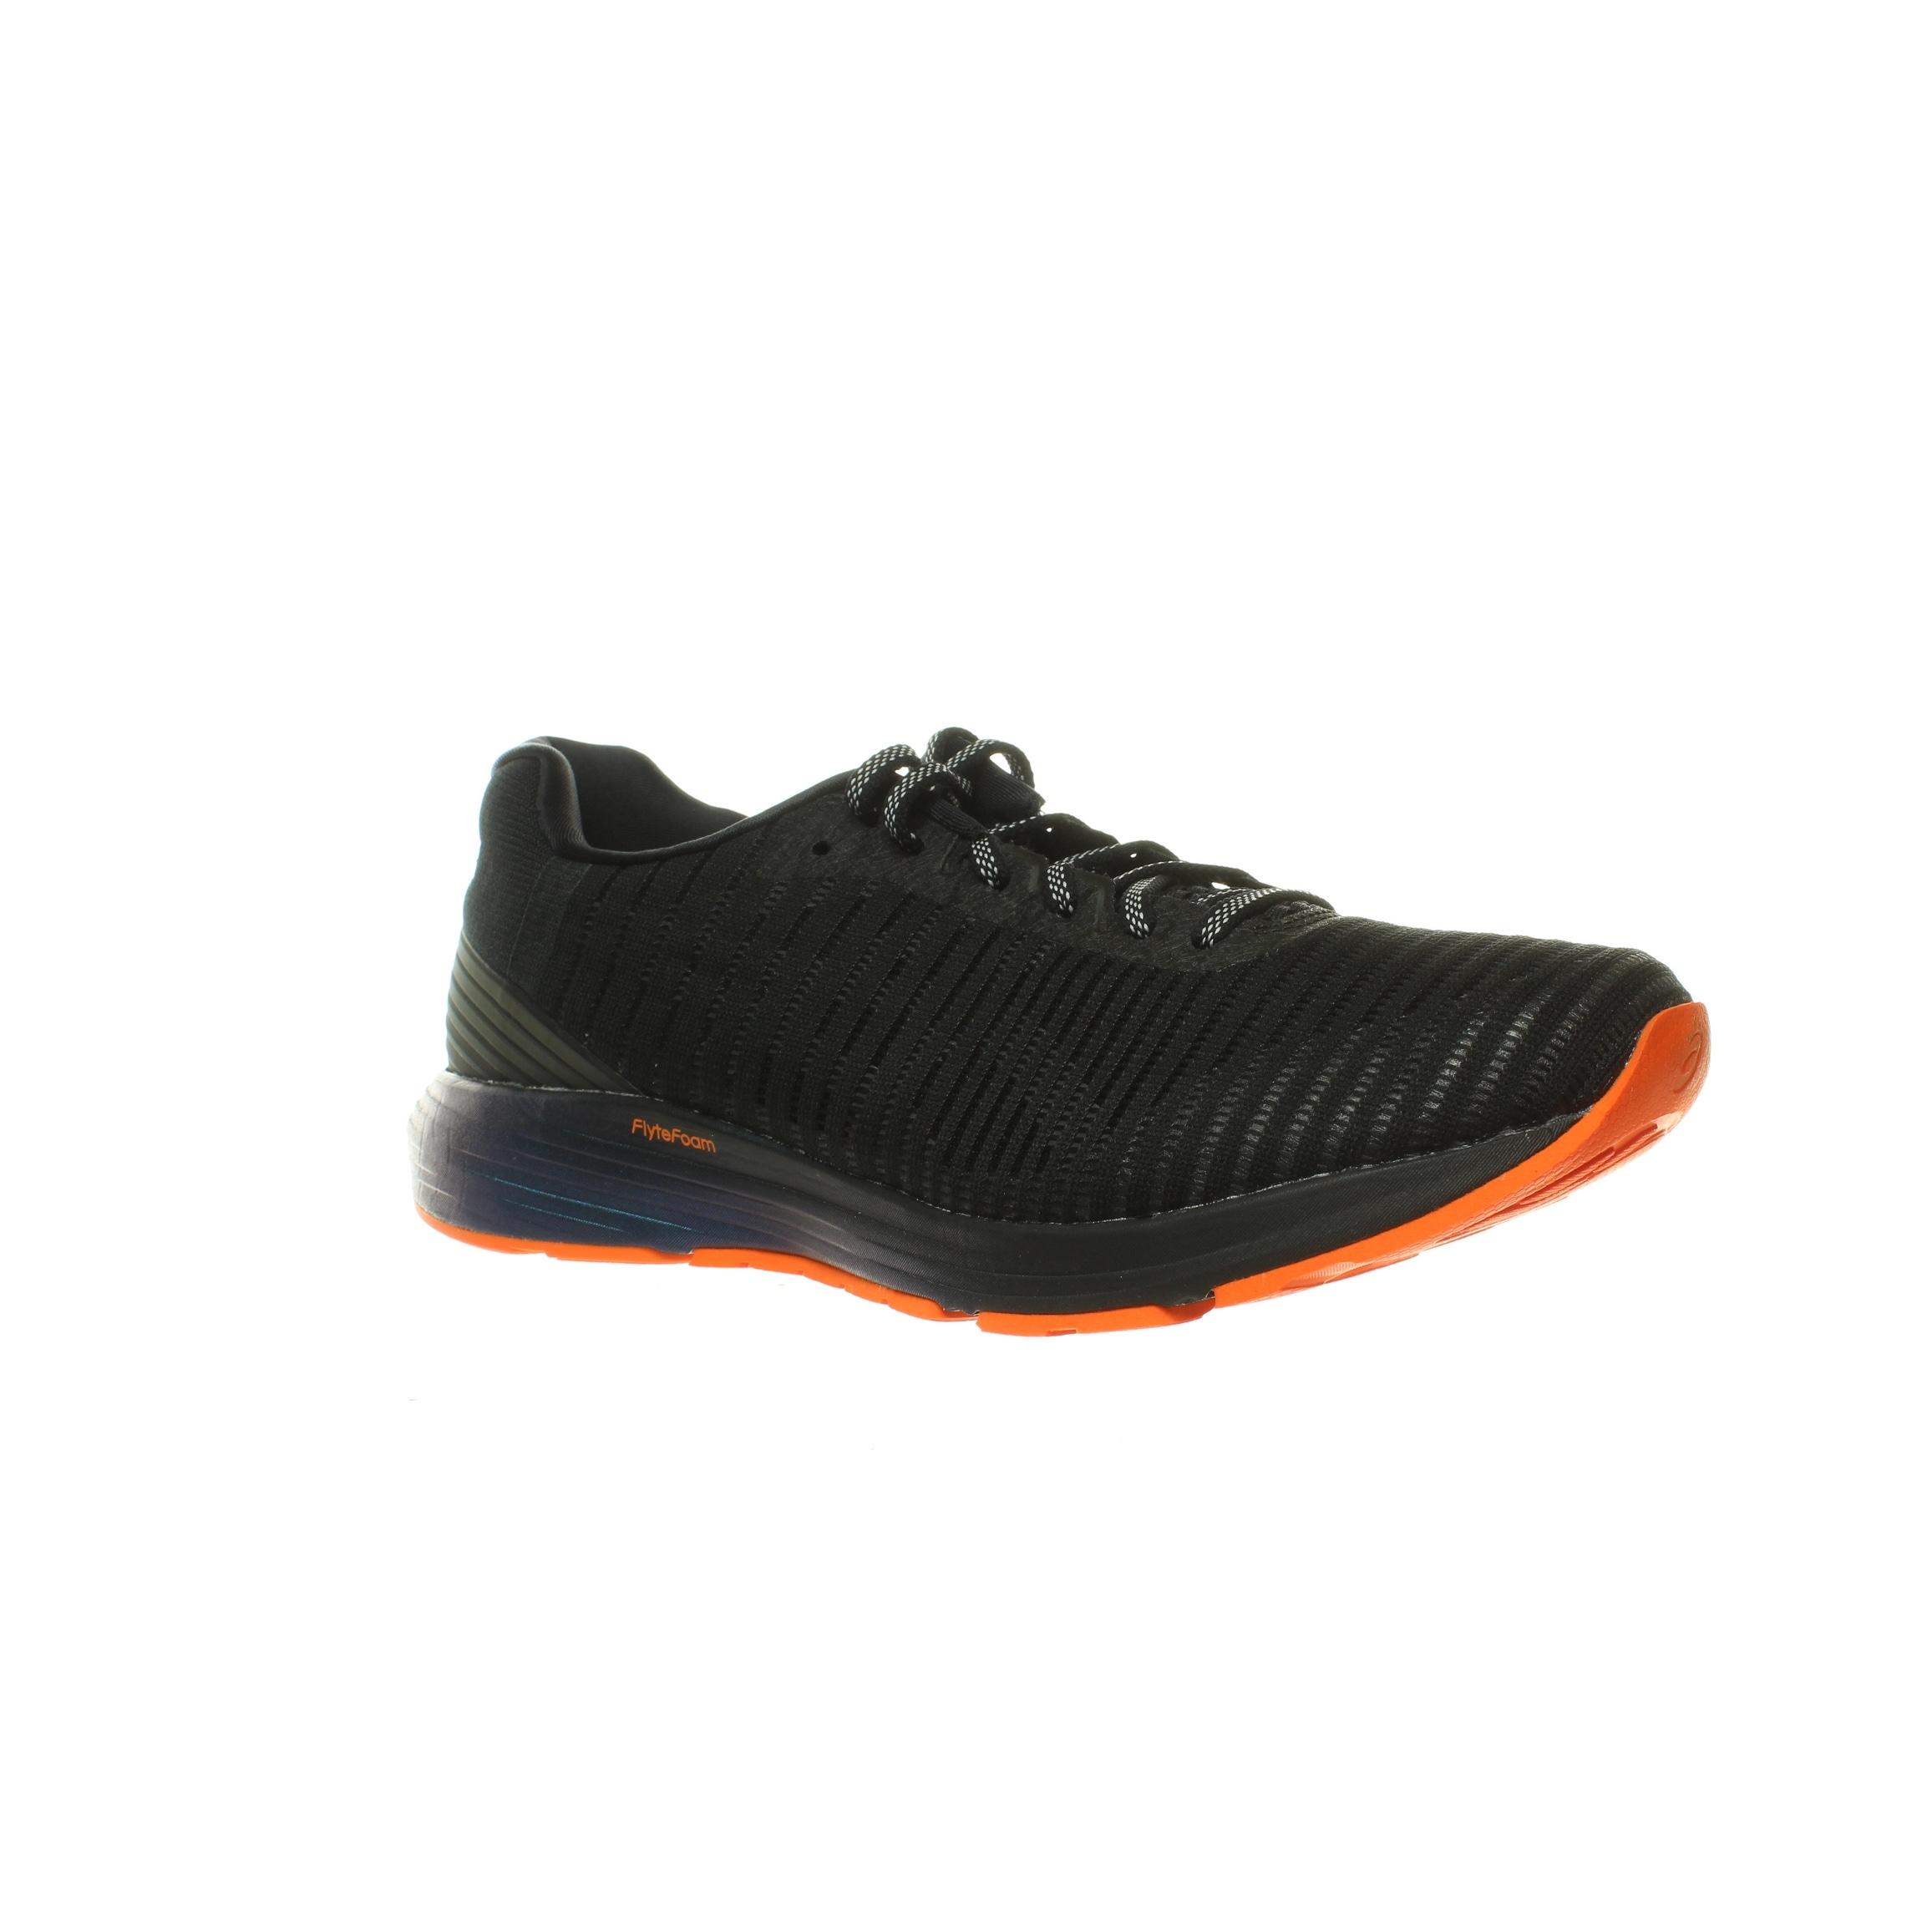 newest e7735 58c4c ASICS Mens Dynaflyte 3 Black Running Shoes Size 9.5